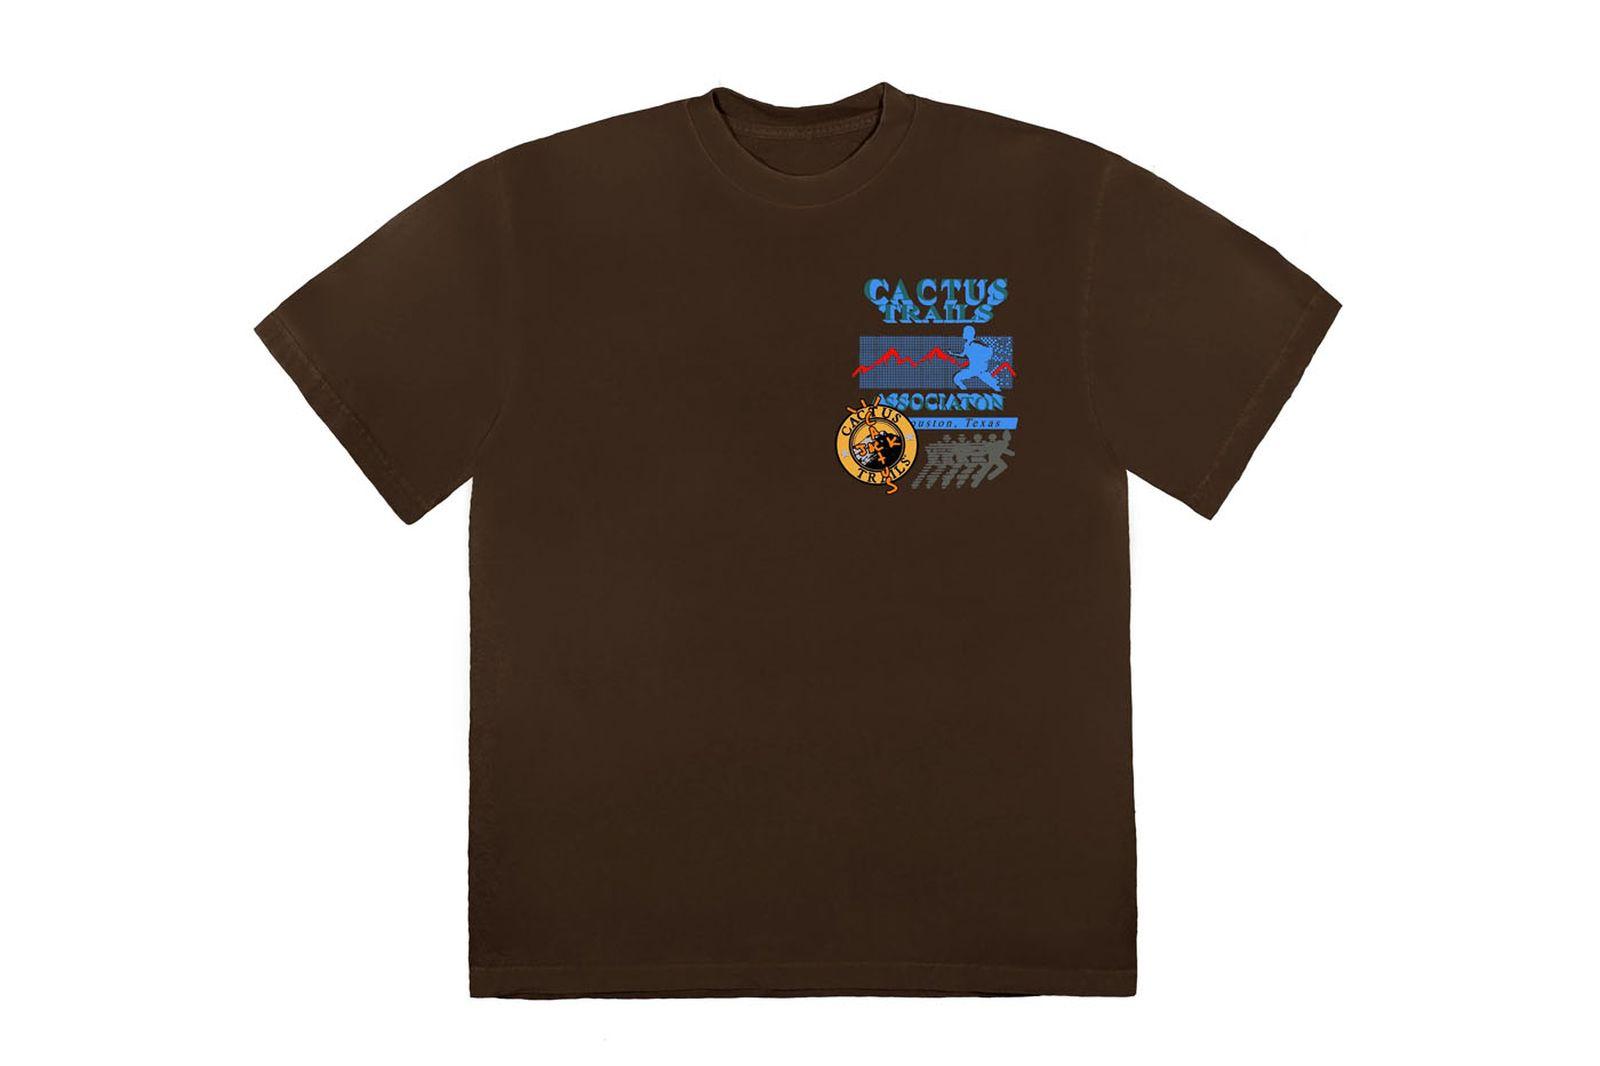 29travis-scott-cactus-trails-merch-may-2020